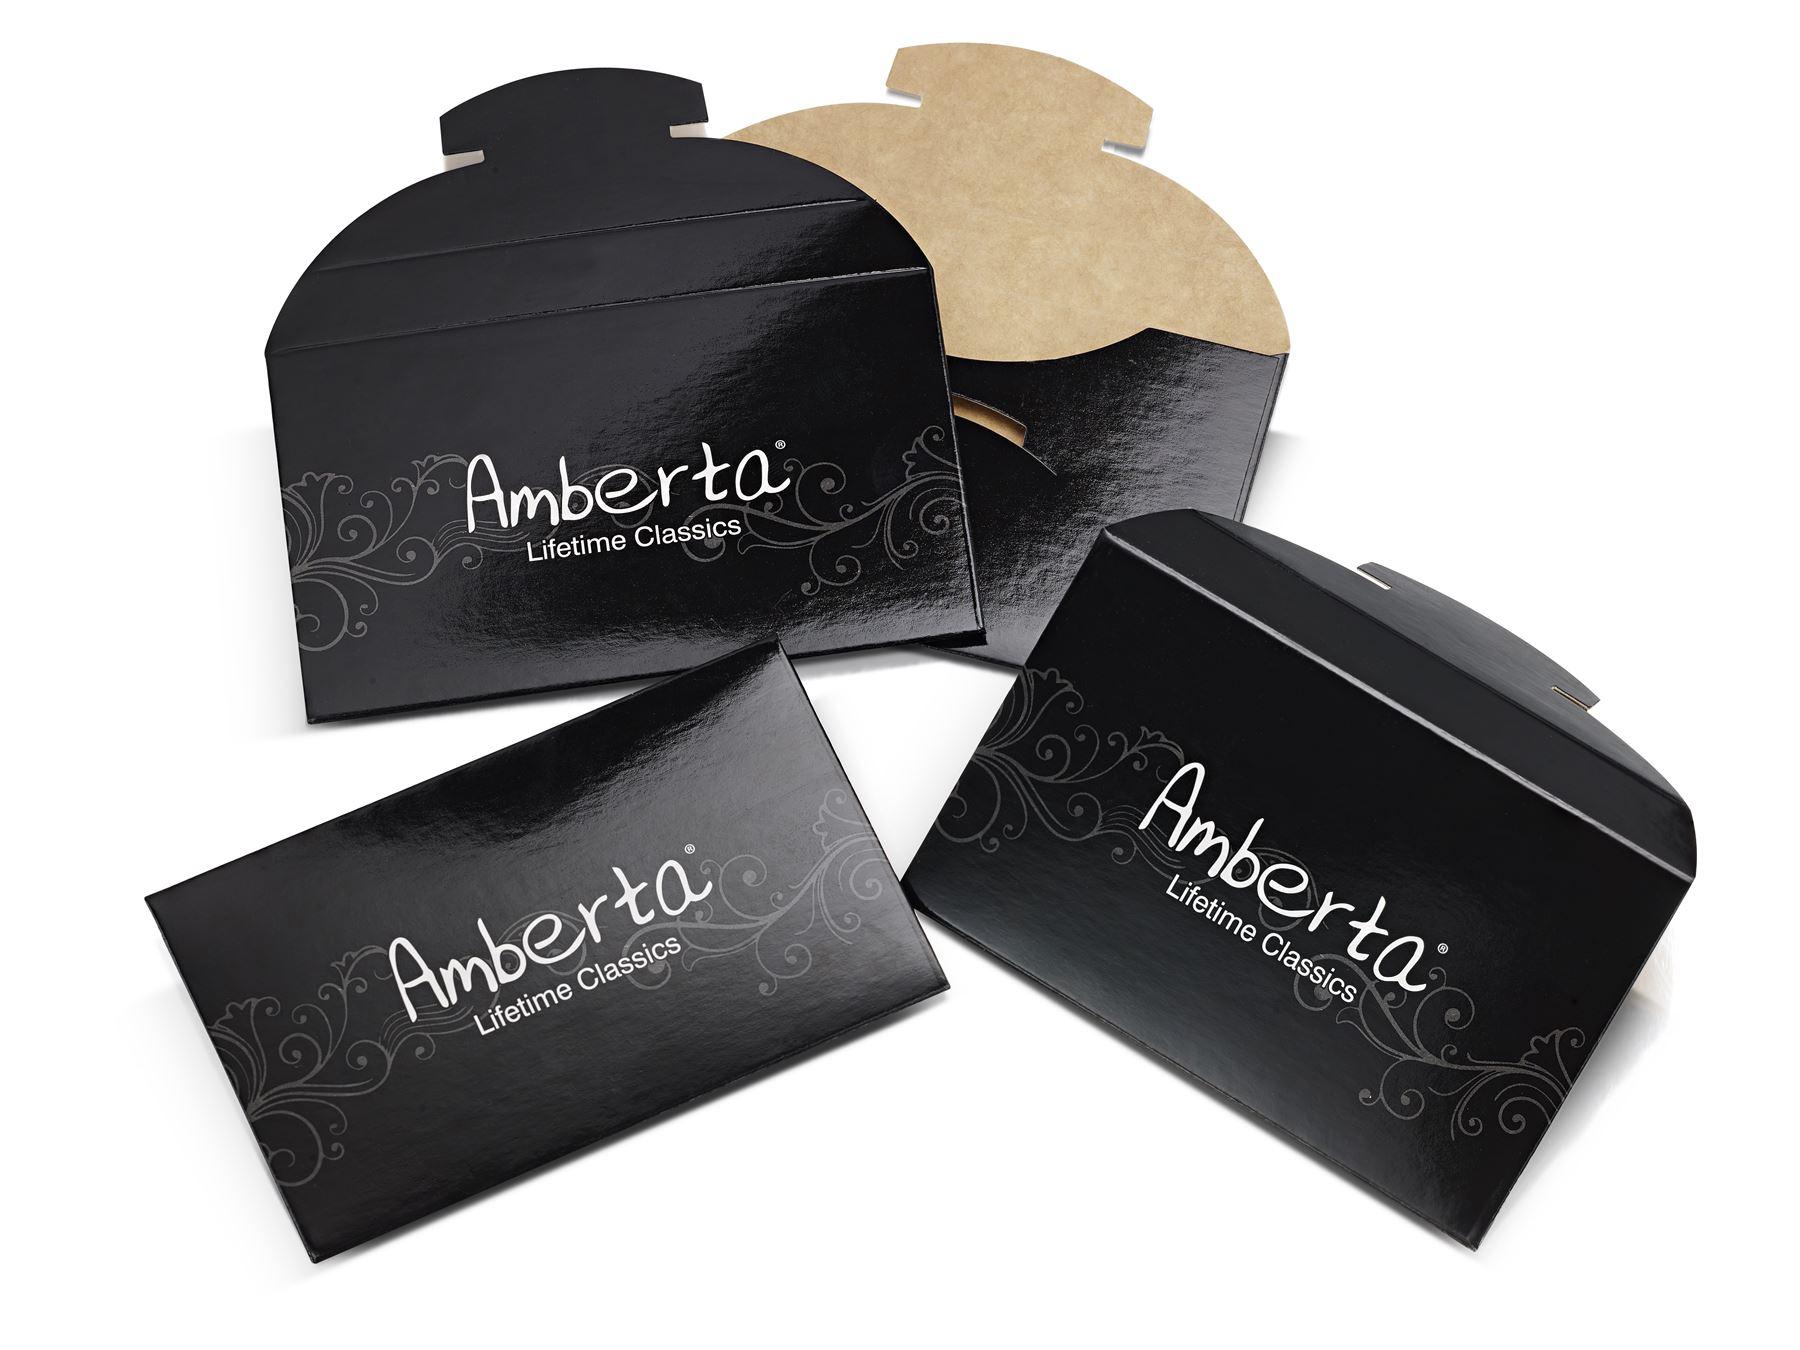 Amberta-Jewelry-925-Sterling-Silver-Adjustable-Bracelet-Italian-Bangle-for-Women miniature 43